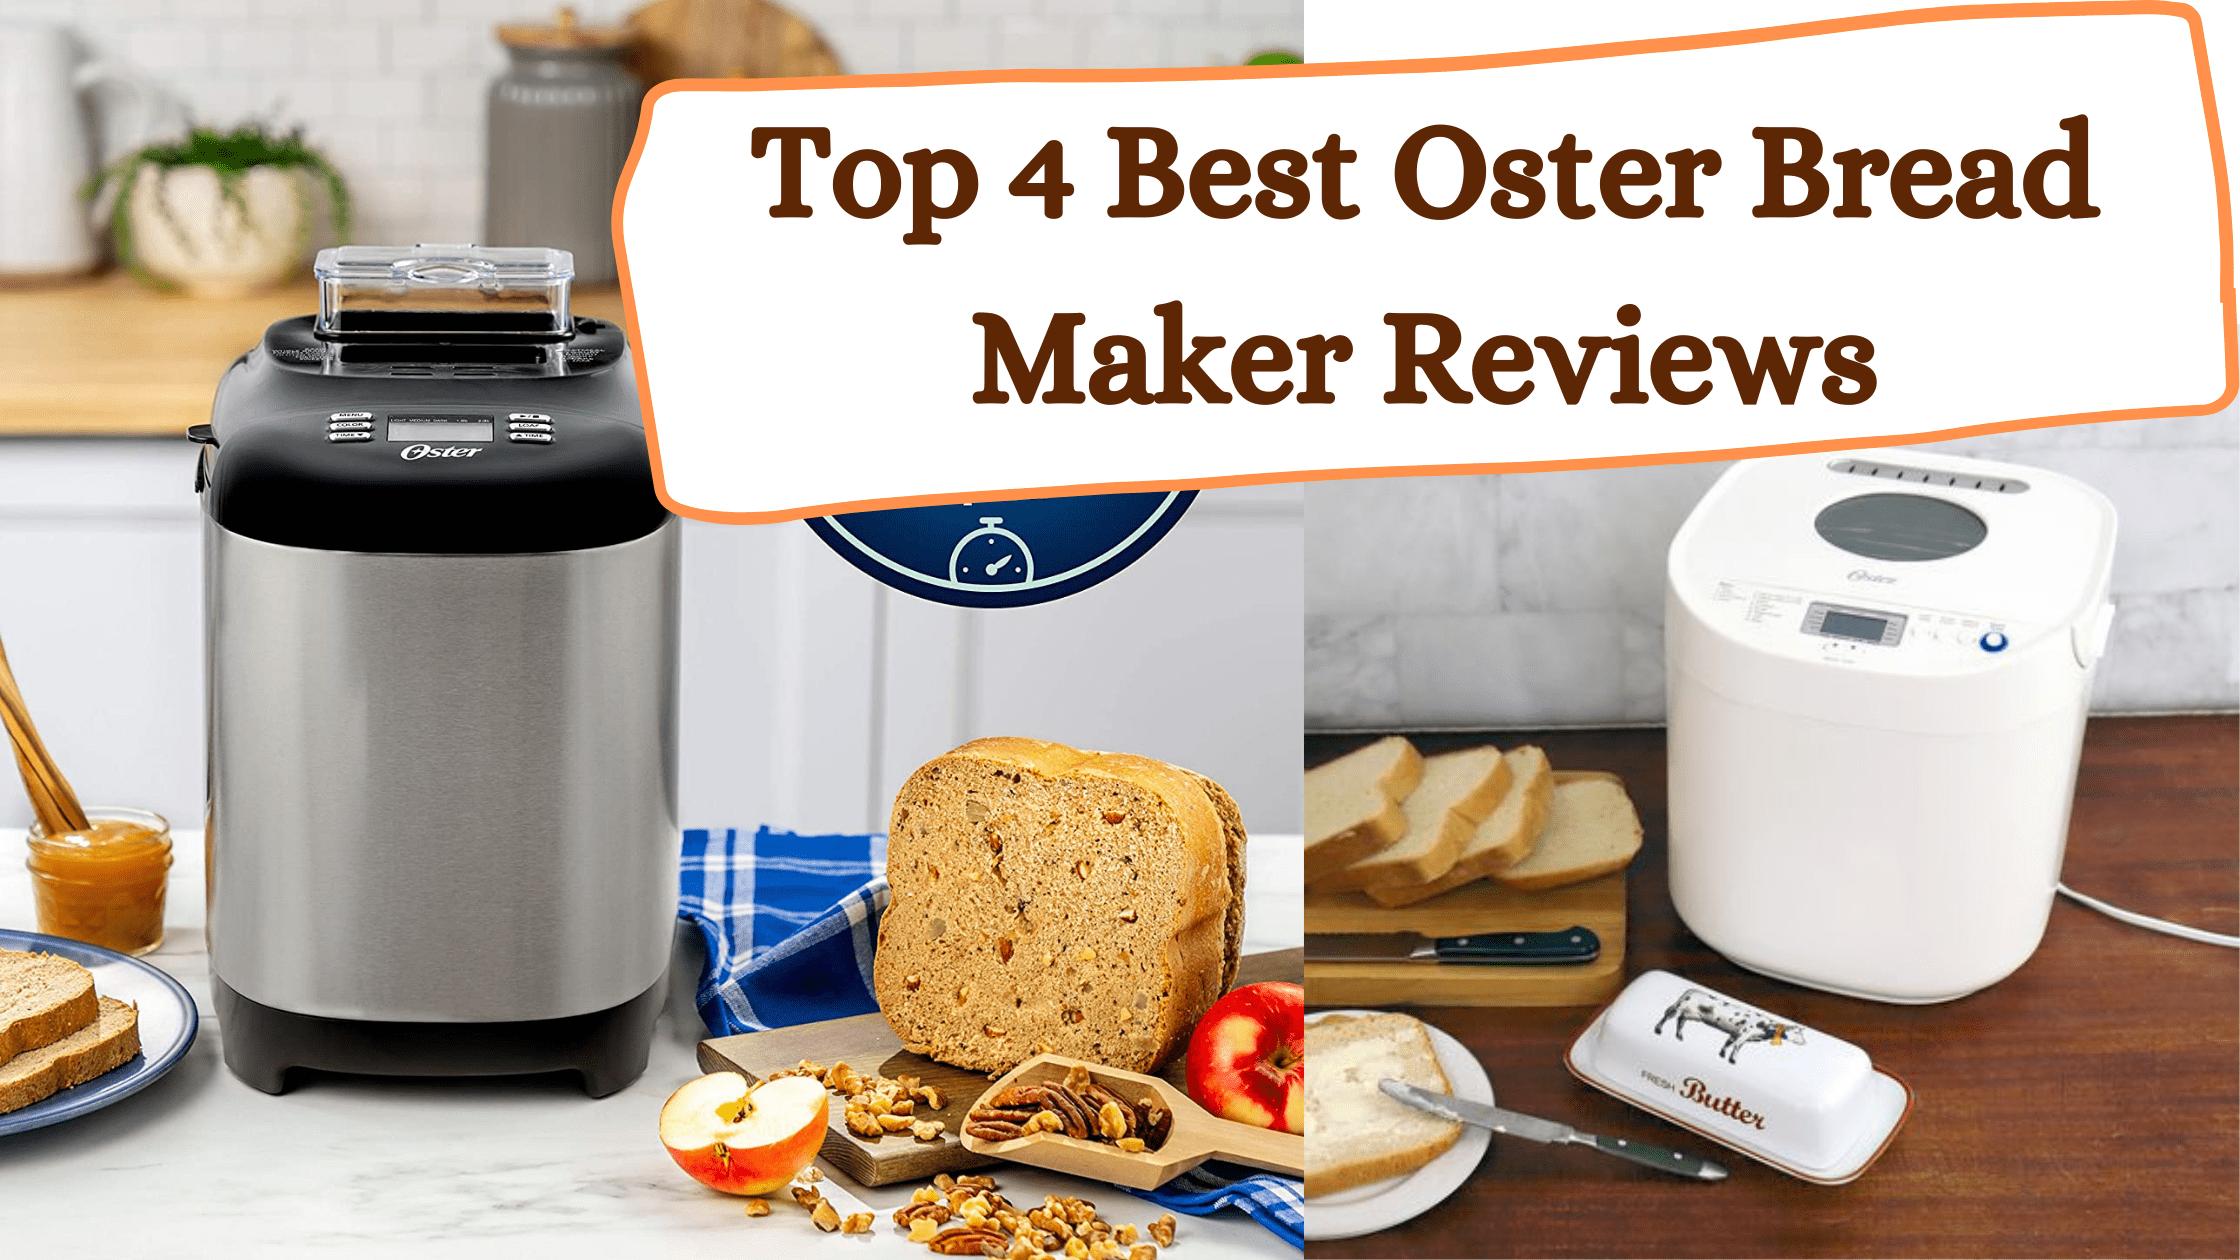 Oster Bread Maker Reviews